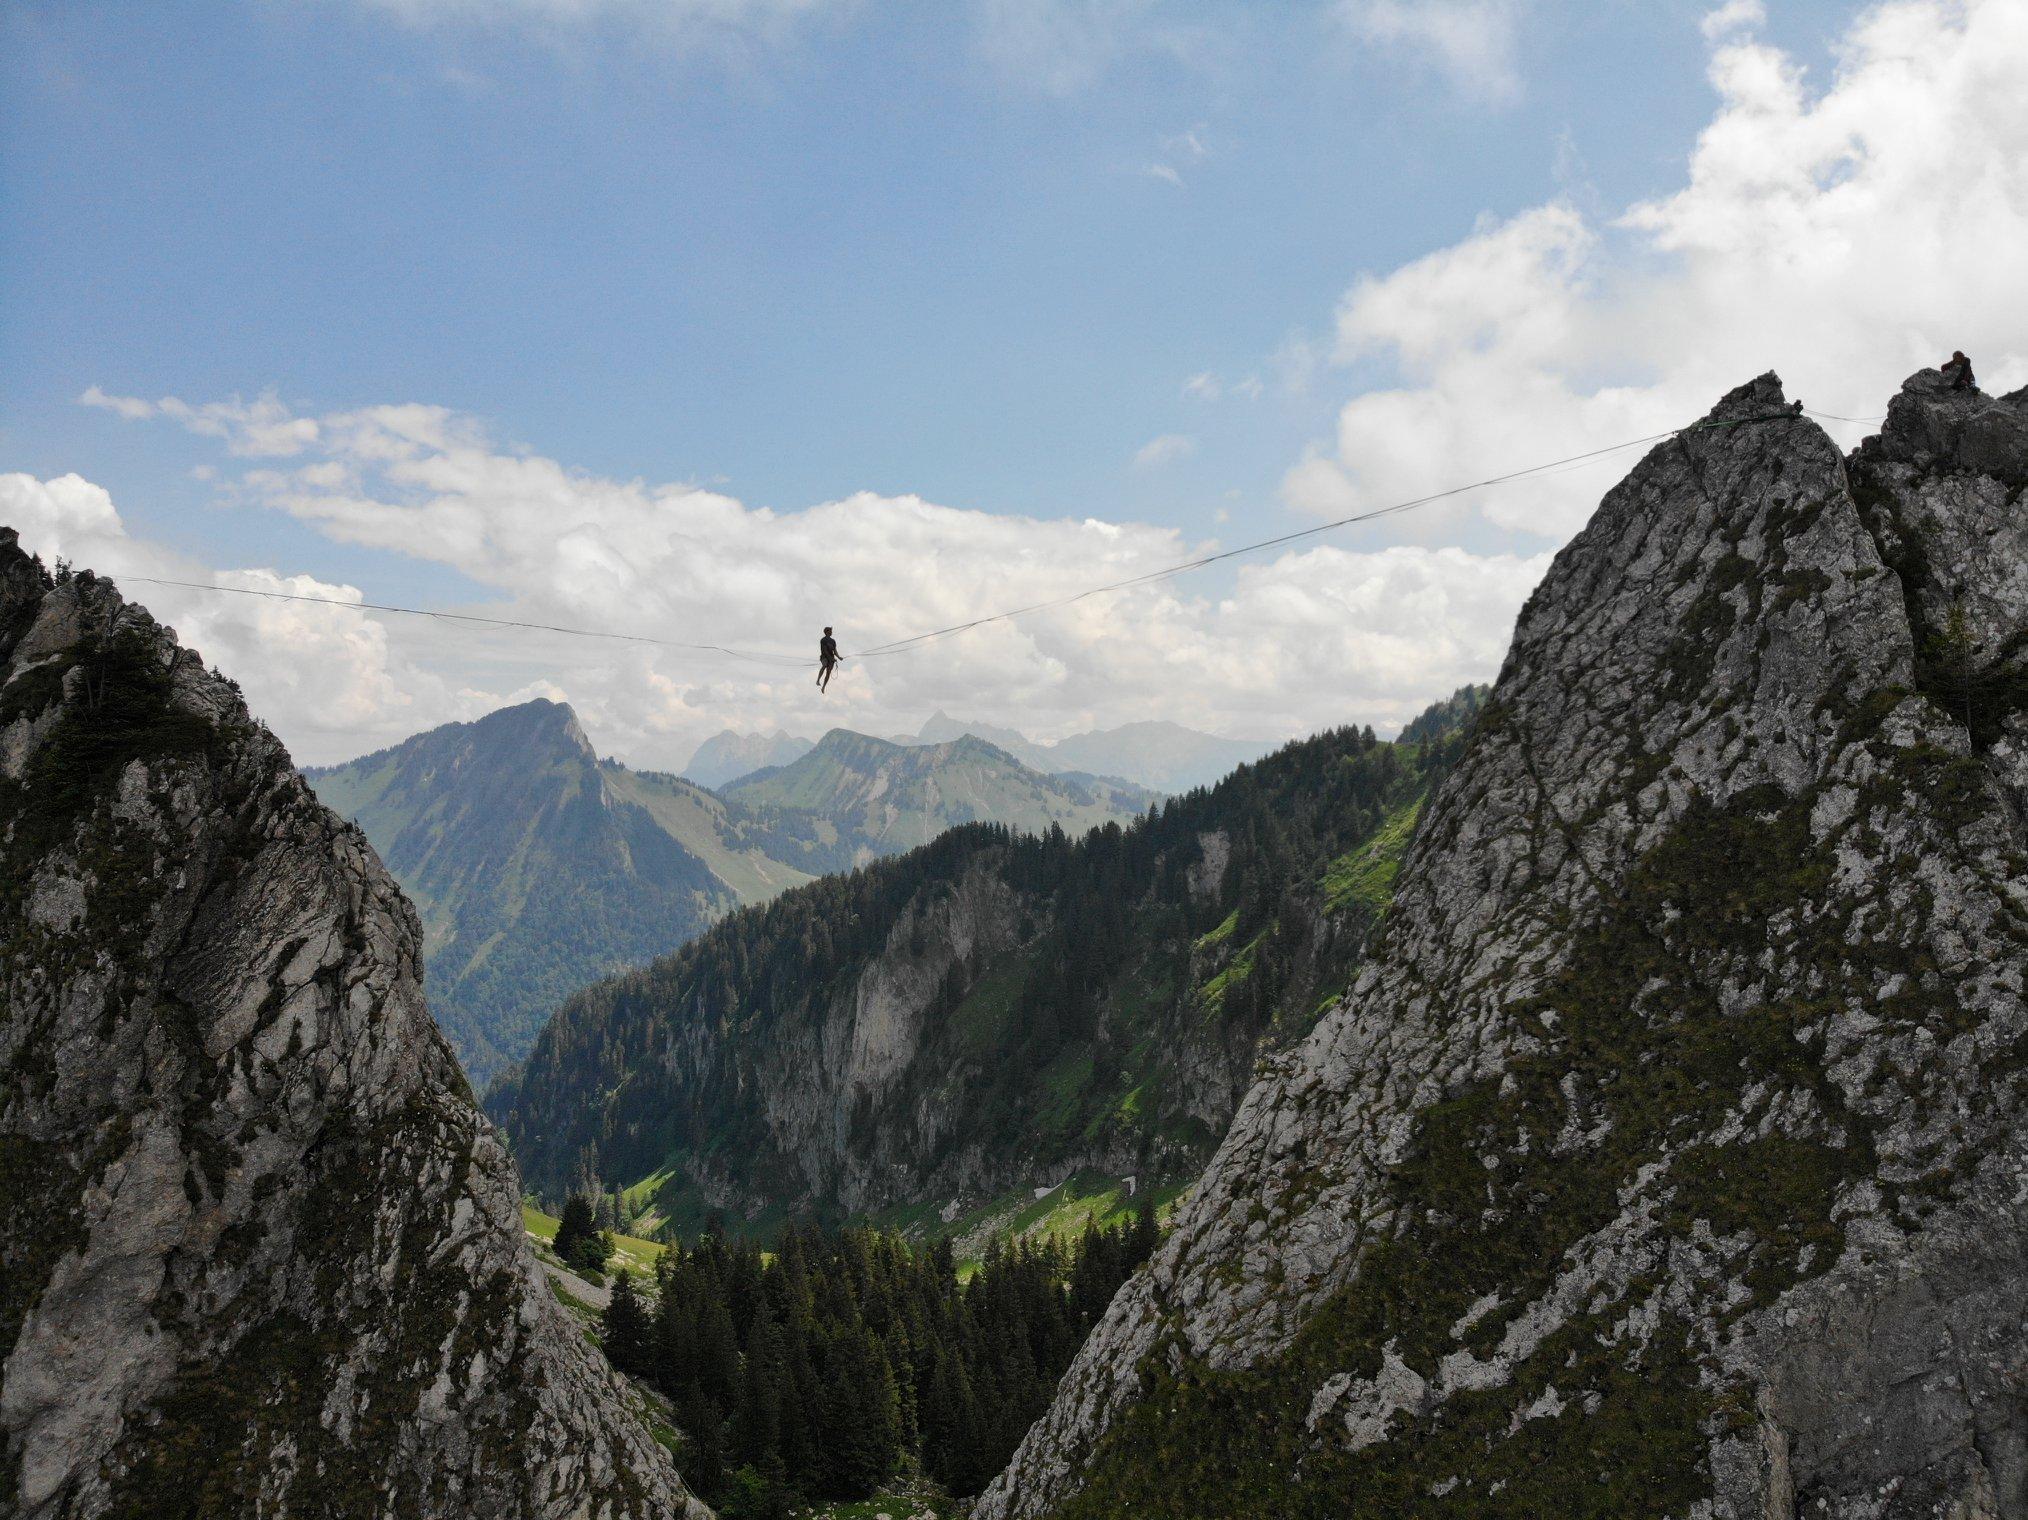 montagne Jaman moutain extreme highline trickline show funambule circus performance spectacle ecole suisse Slackline Lyell Grunberg  (2).jpg